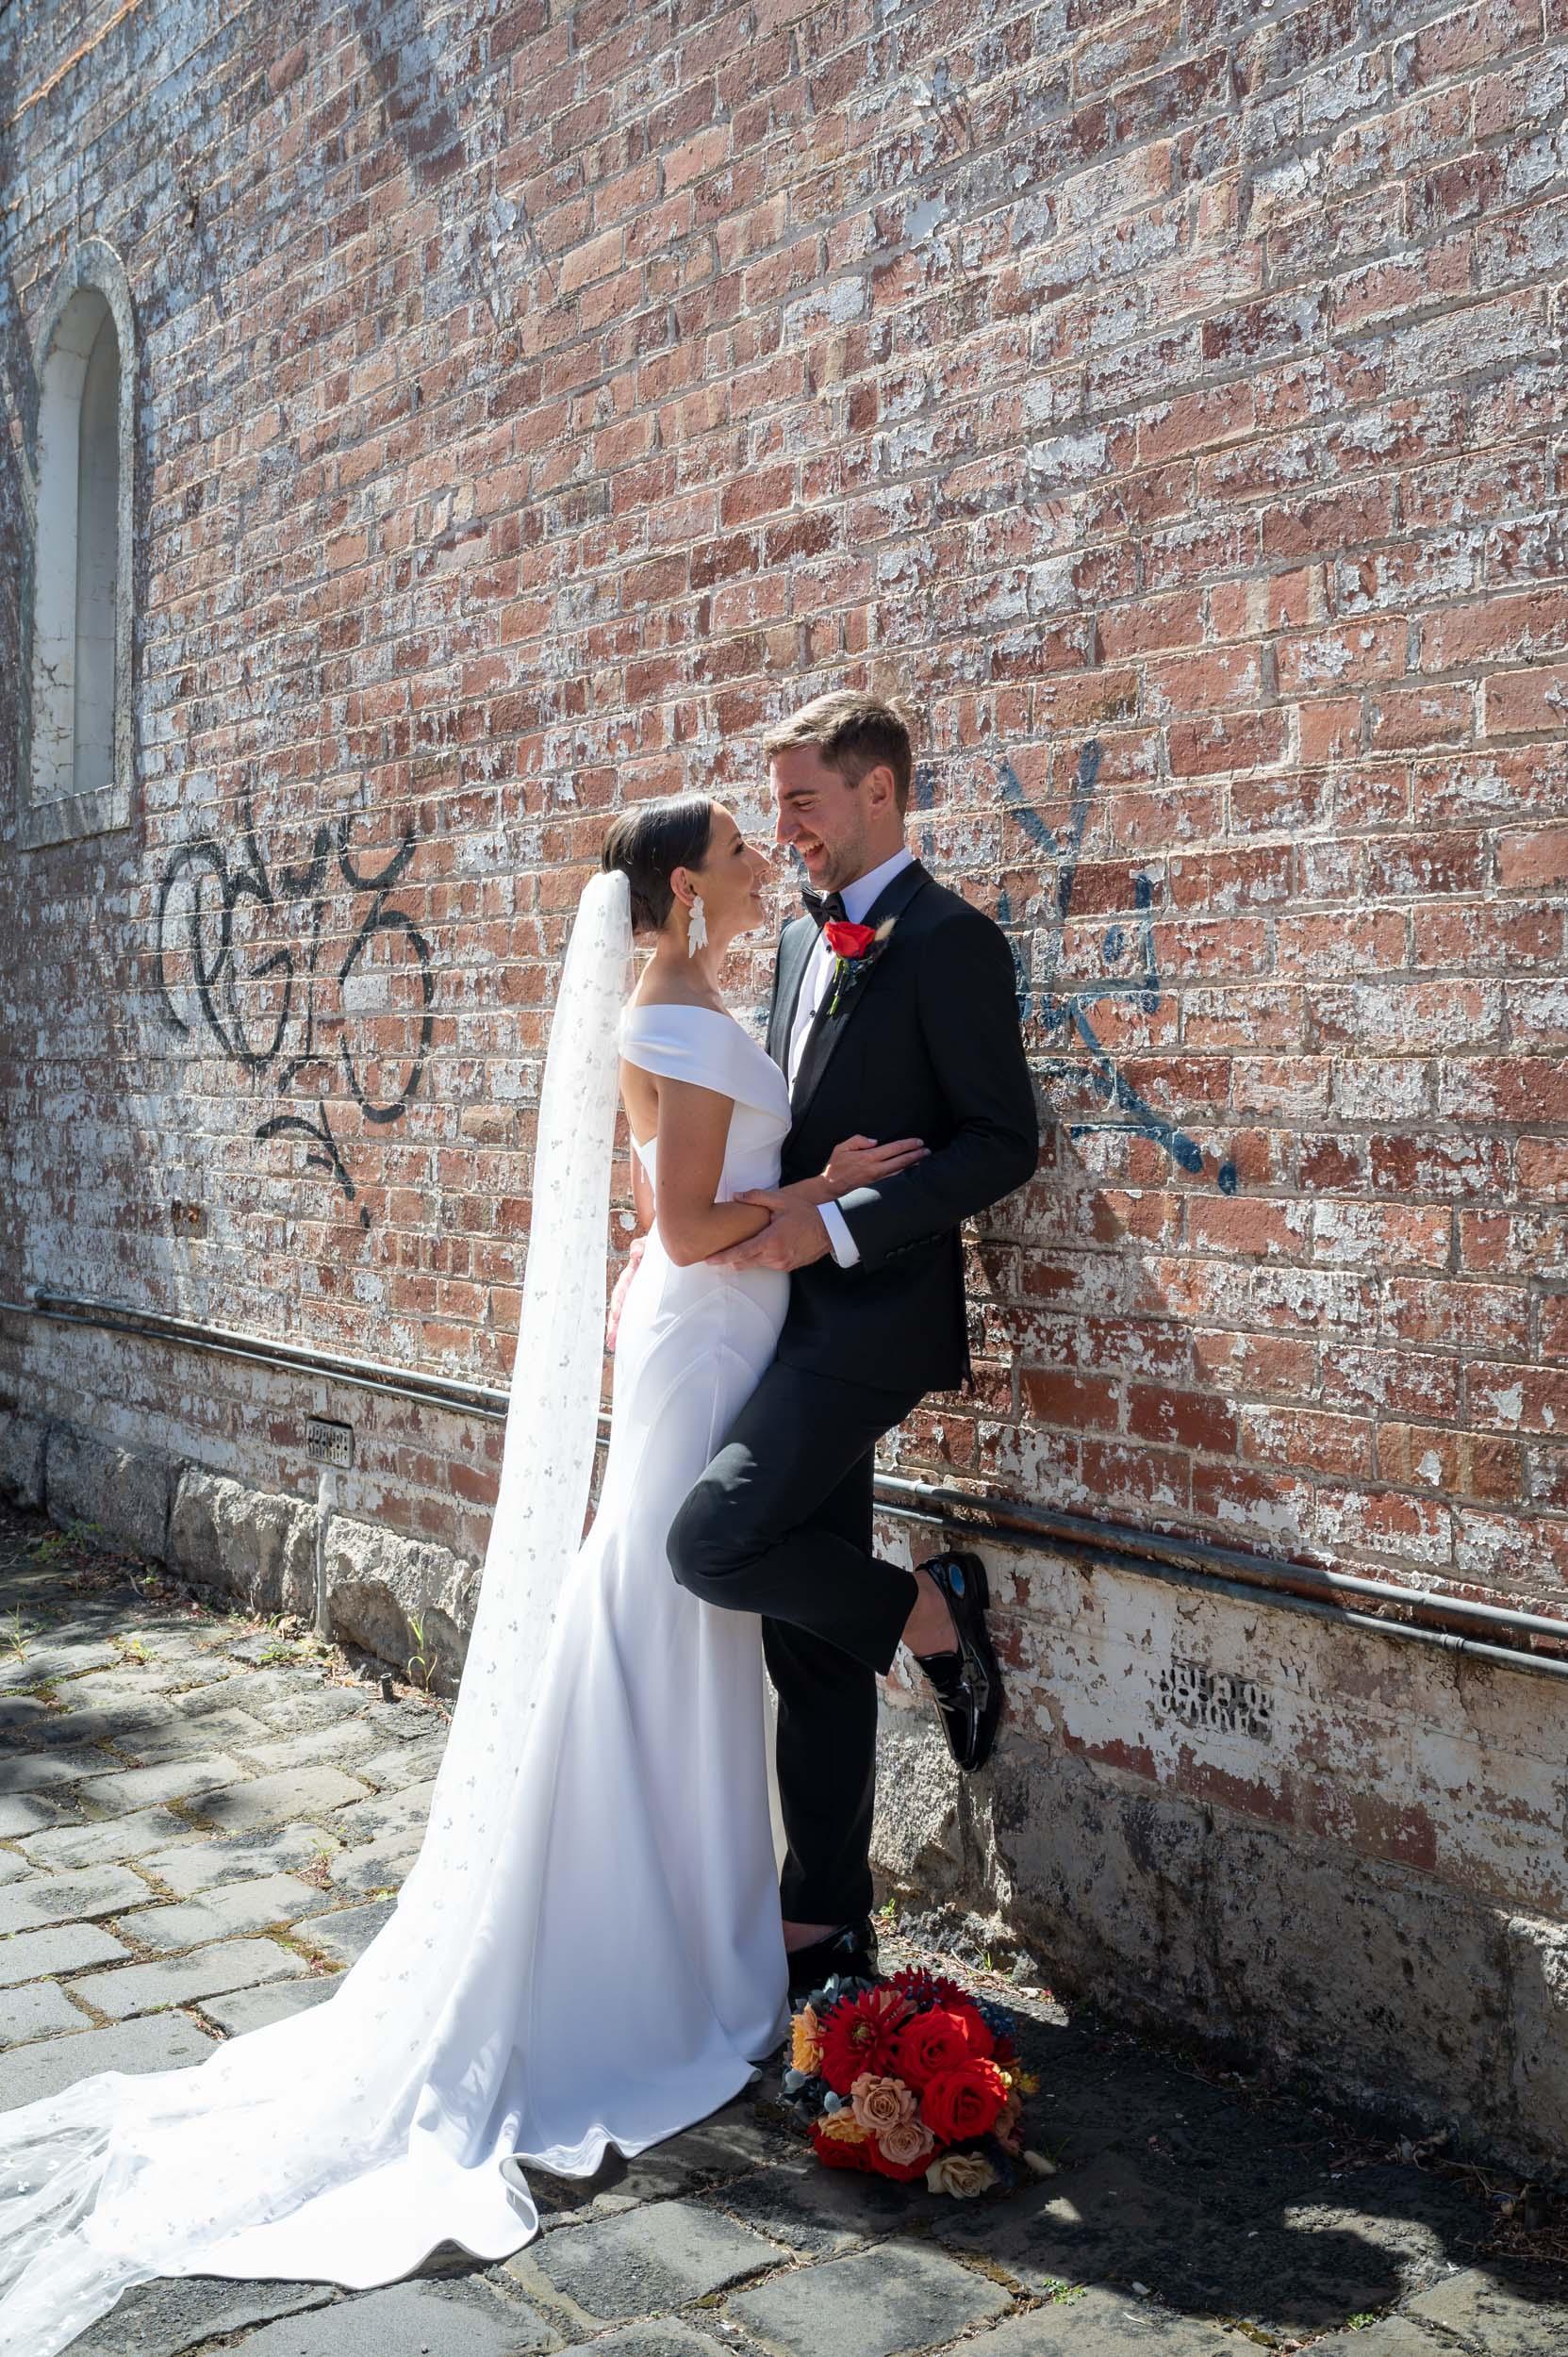 Wedding, Bride & Groom, Wedding Day, Bridal Shoot, Melbourne Wedding, Brad Geddes Photography, Melbourne Laneway, Laneway Wedding Shoot, Georgia Young Couture, Love Alfalfa Florals